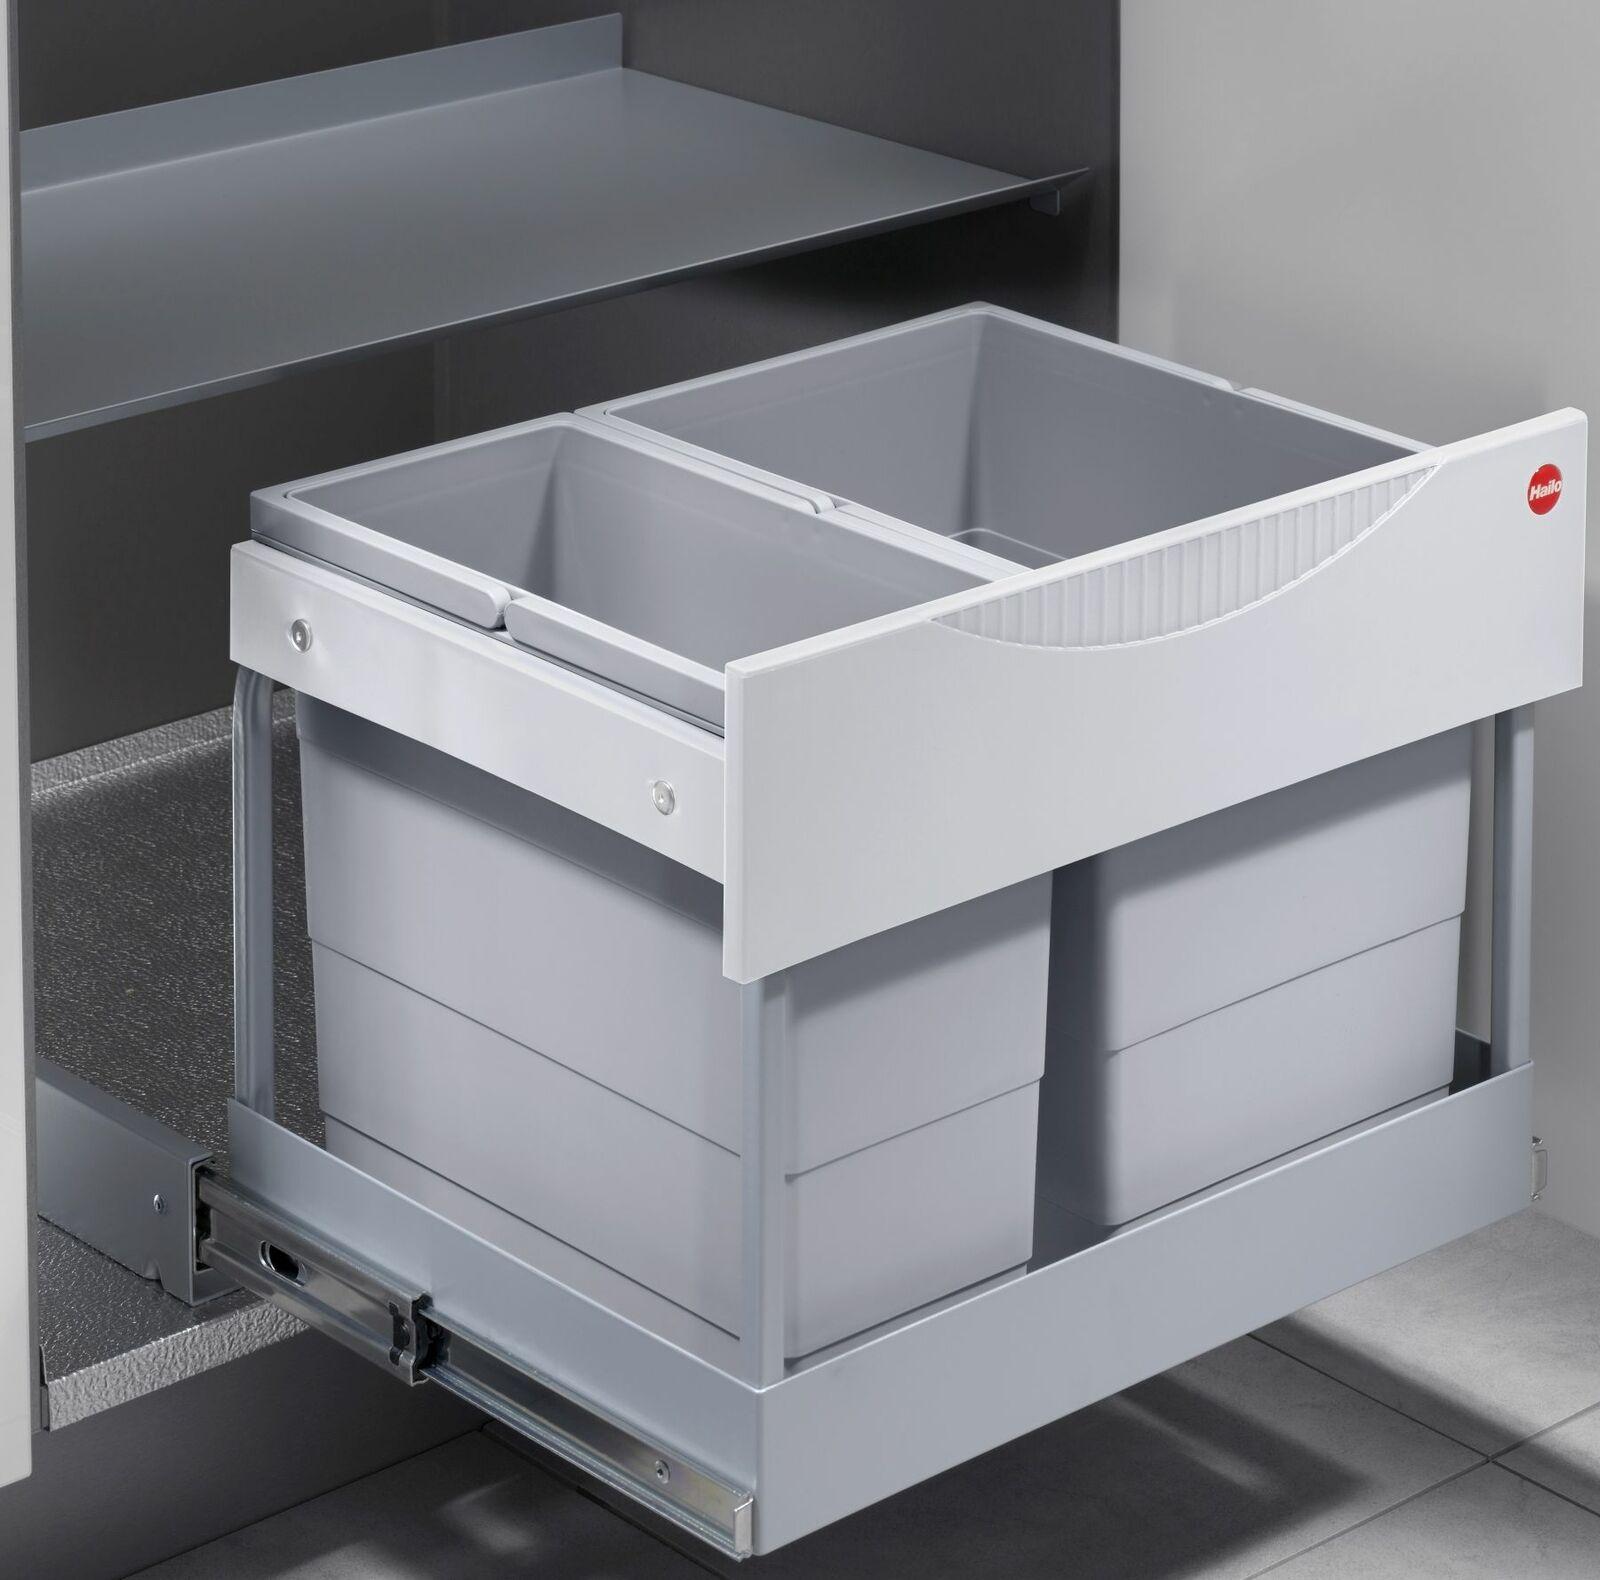 Einbau-Mülleimer Küche 30 L Müllsammler Abfalleimer Hailo Müllsystem *516063